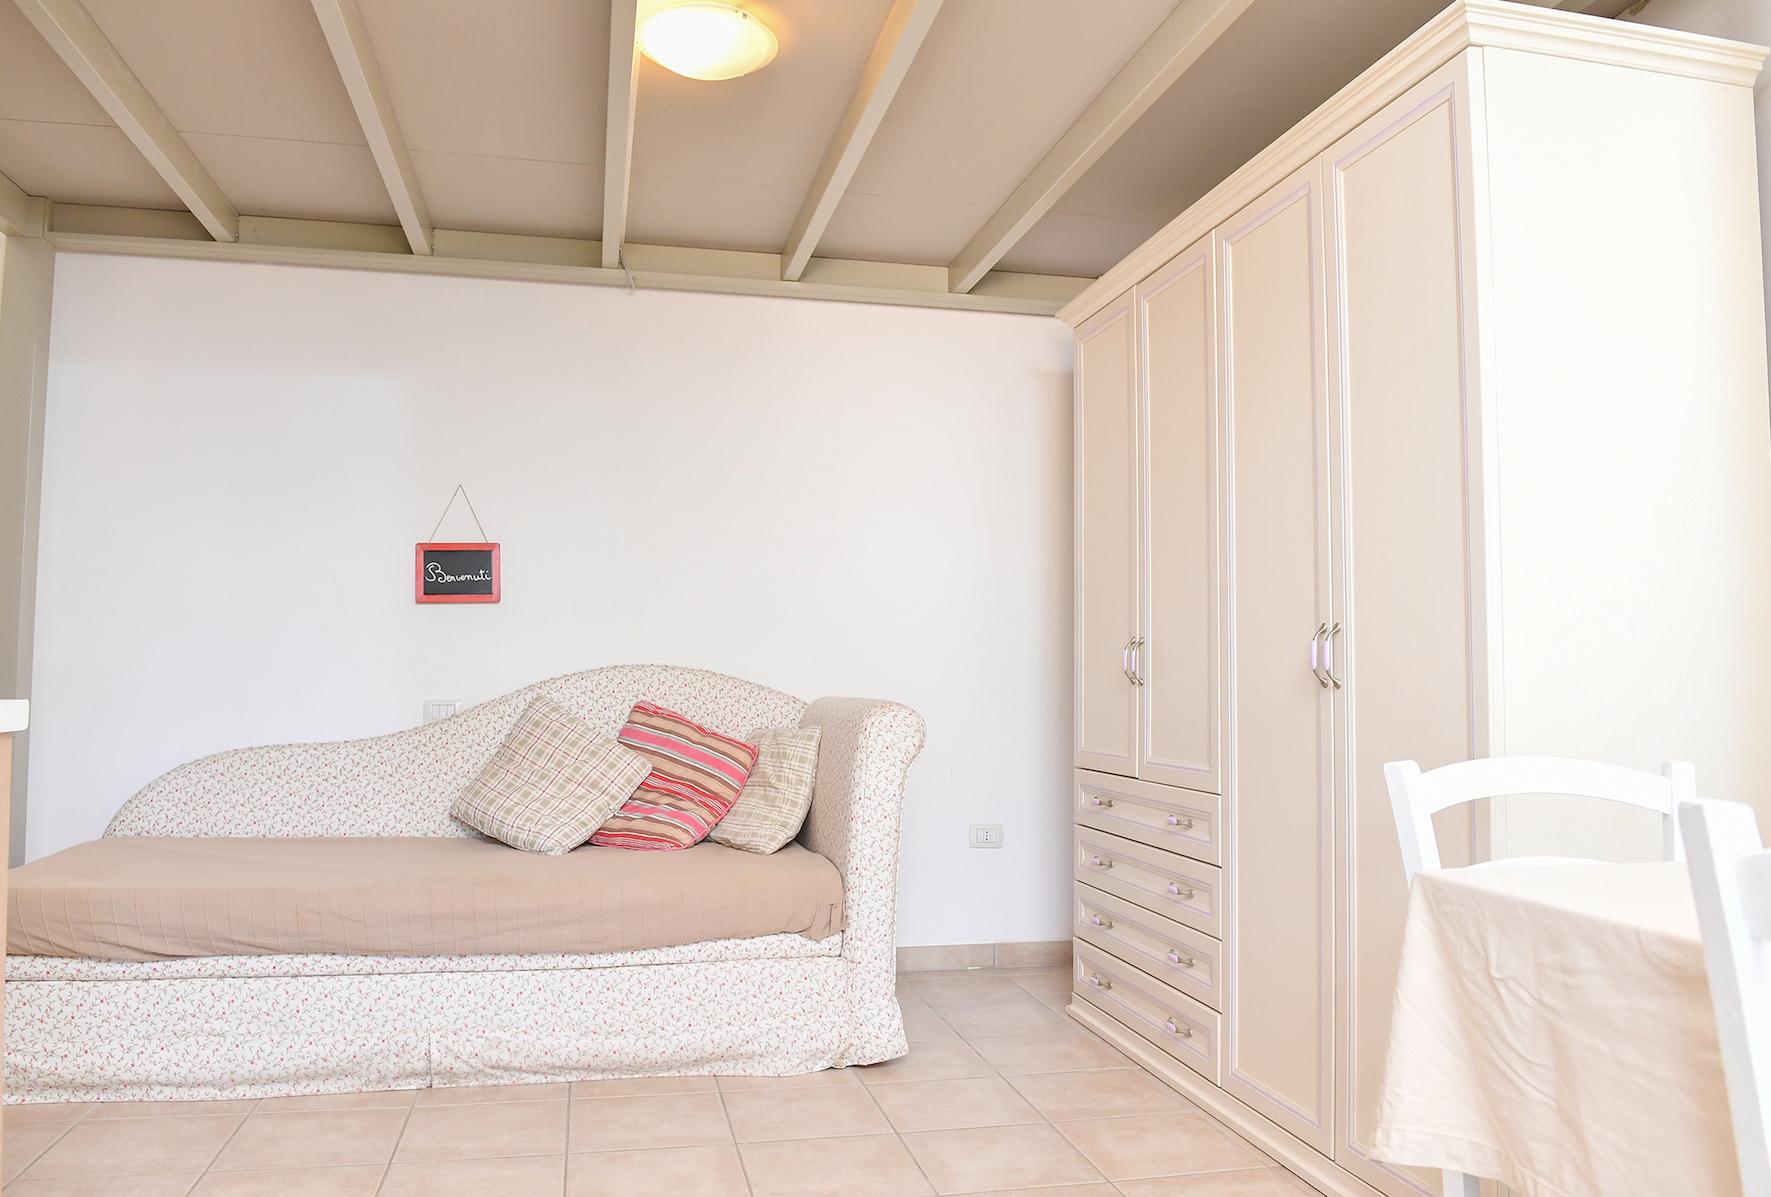 Lecce 8 - Living room